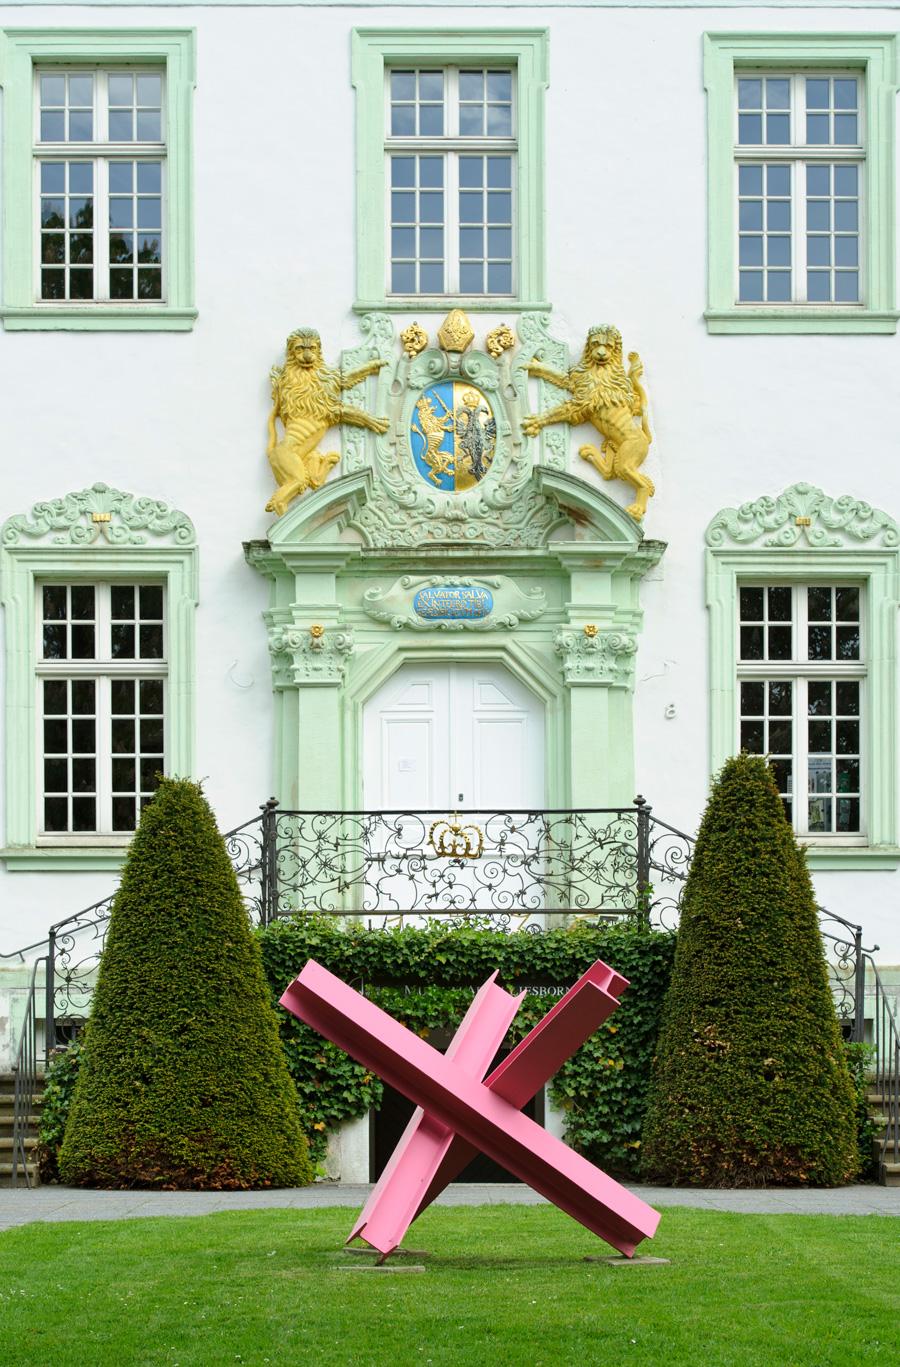 La vie en rose, Liesborn, 2012_DSC1011